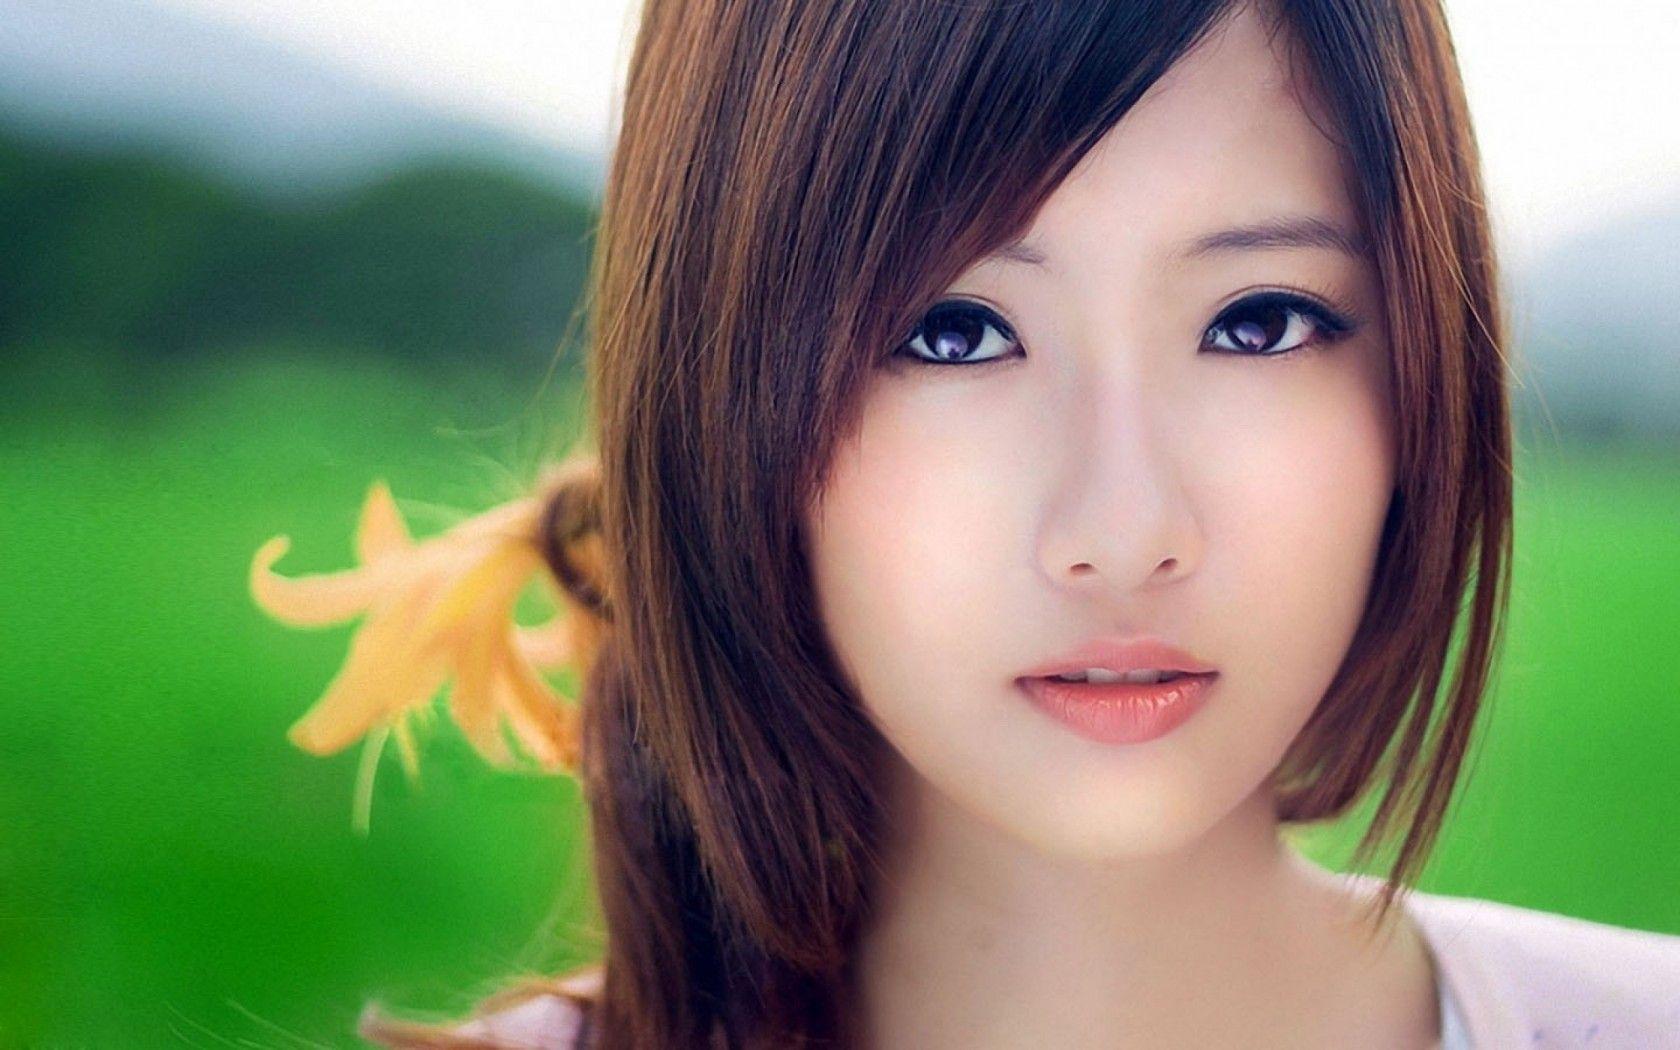 Cute women korea nice pict wallpaper httpwalluckycute cute women korea nice pict wallpaper httpwalluckycute voltagebd Images